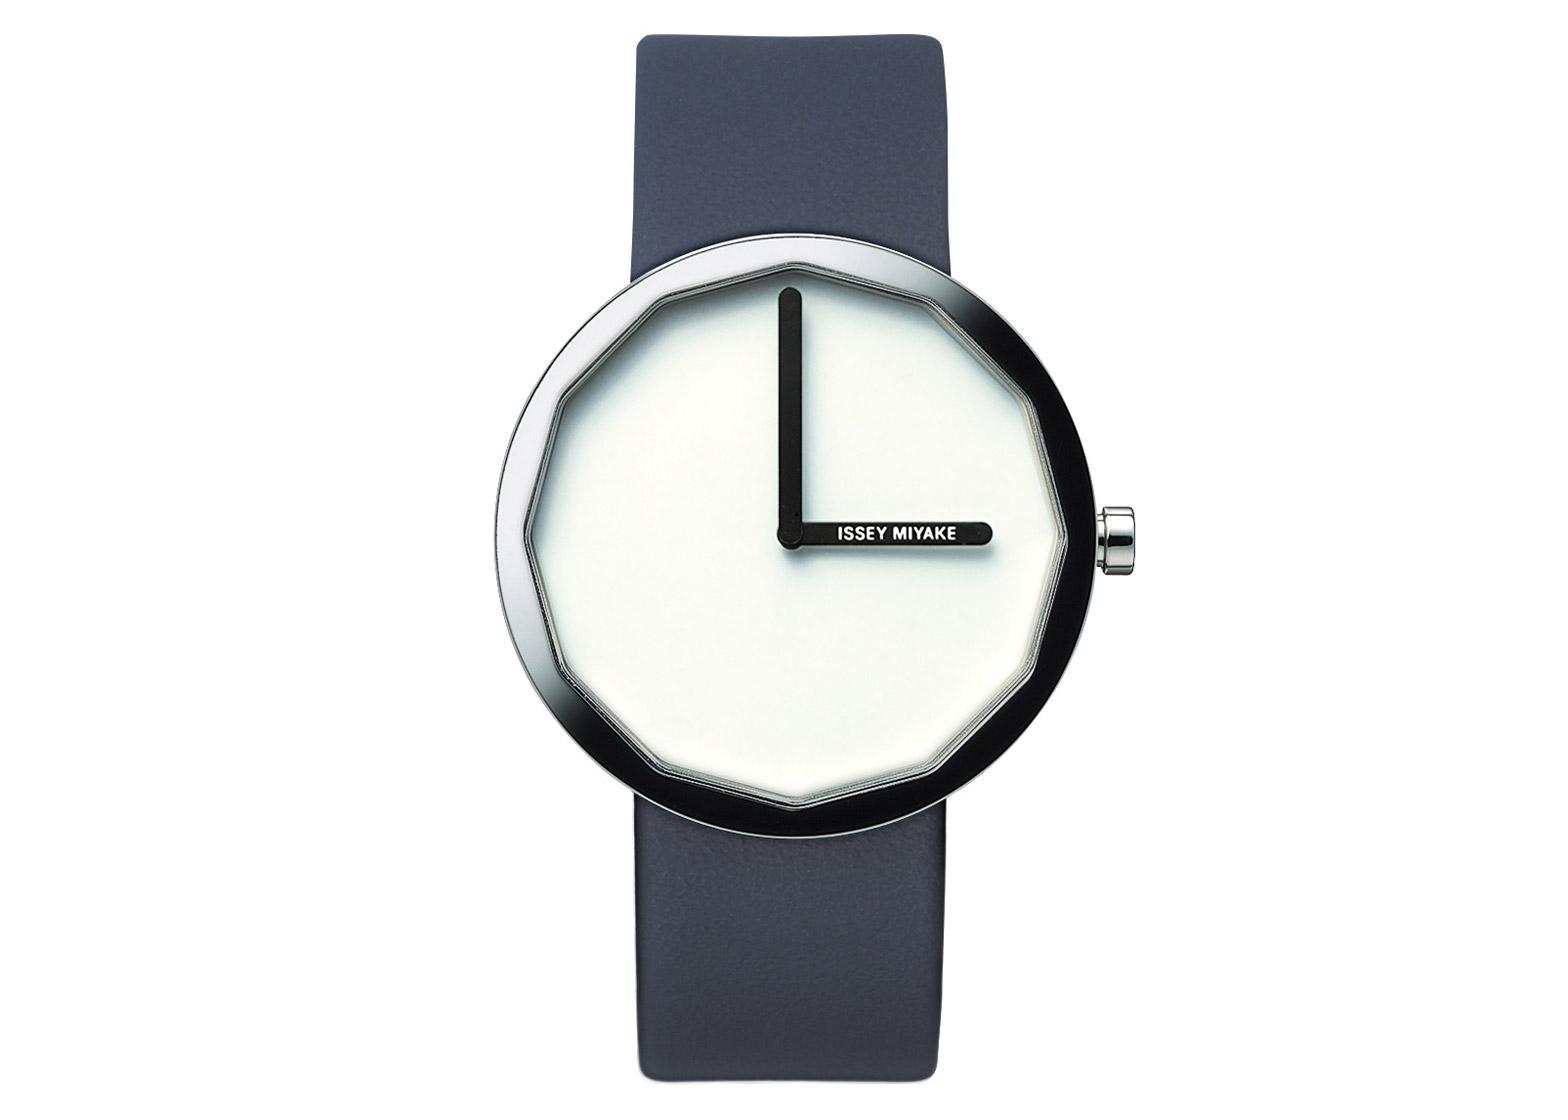 The Twelve watch, designed by Naoto Fukasawa for Issey Miyake